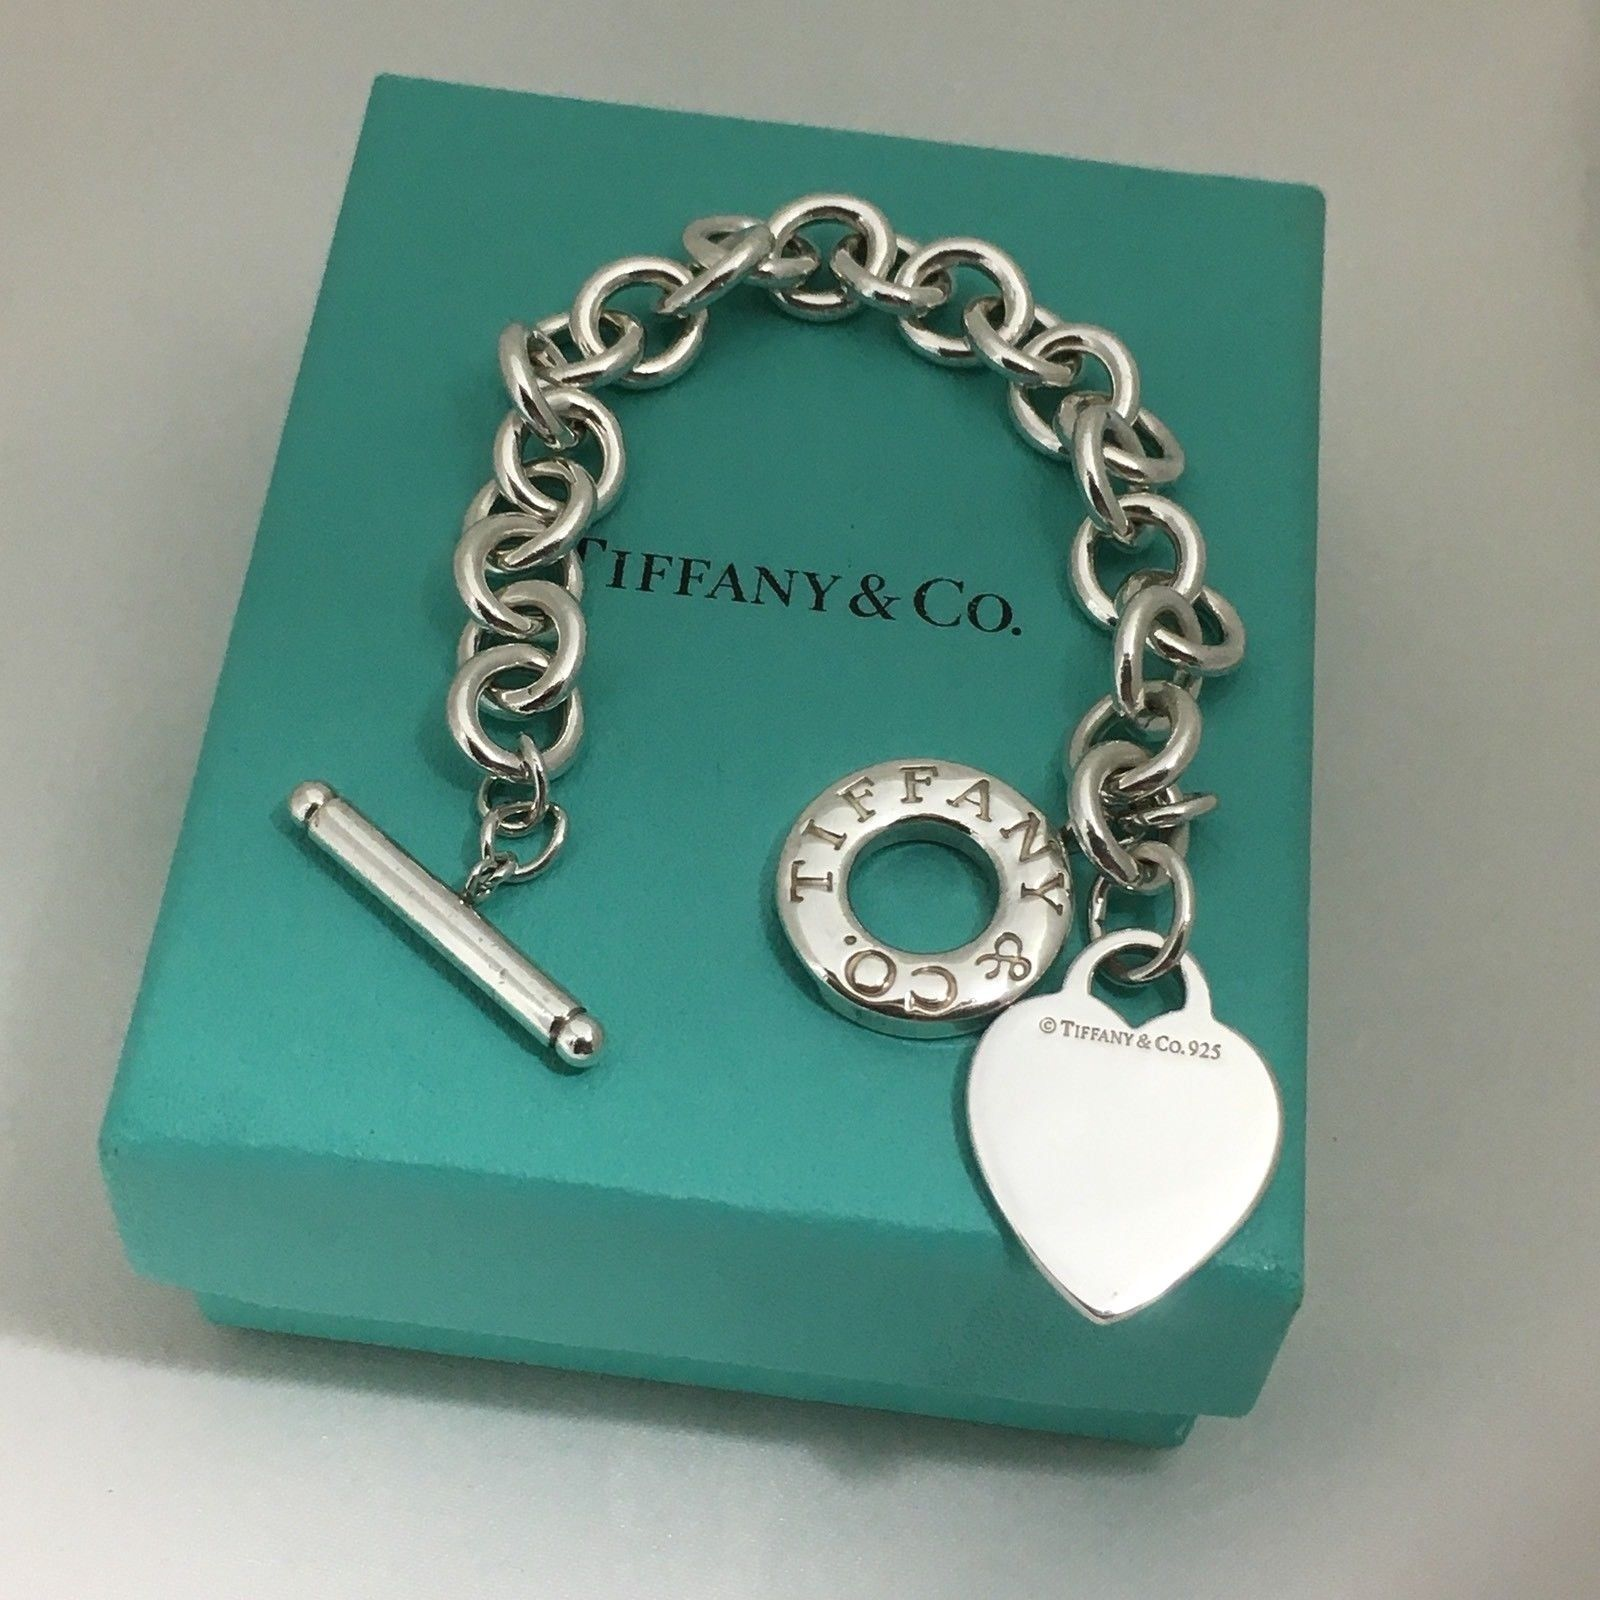 0a0d38ba7 Tiffany & Co Sterling Silver Blank Engravable Heart Tag Toggle Bracelet ( eBay Link)